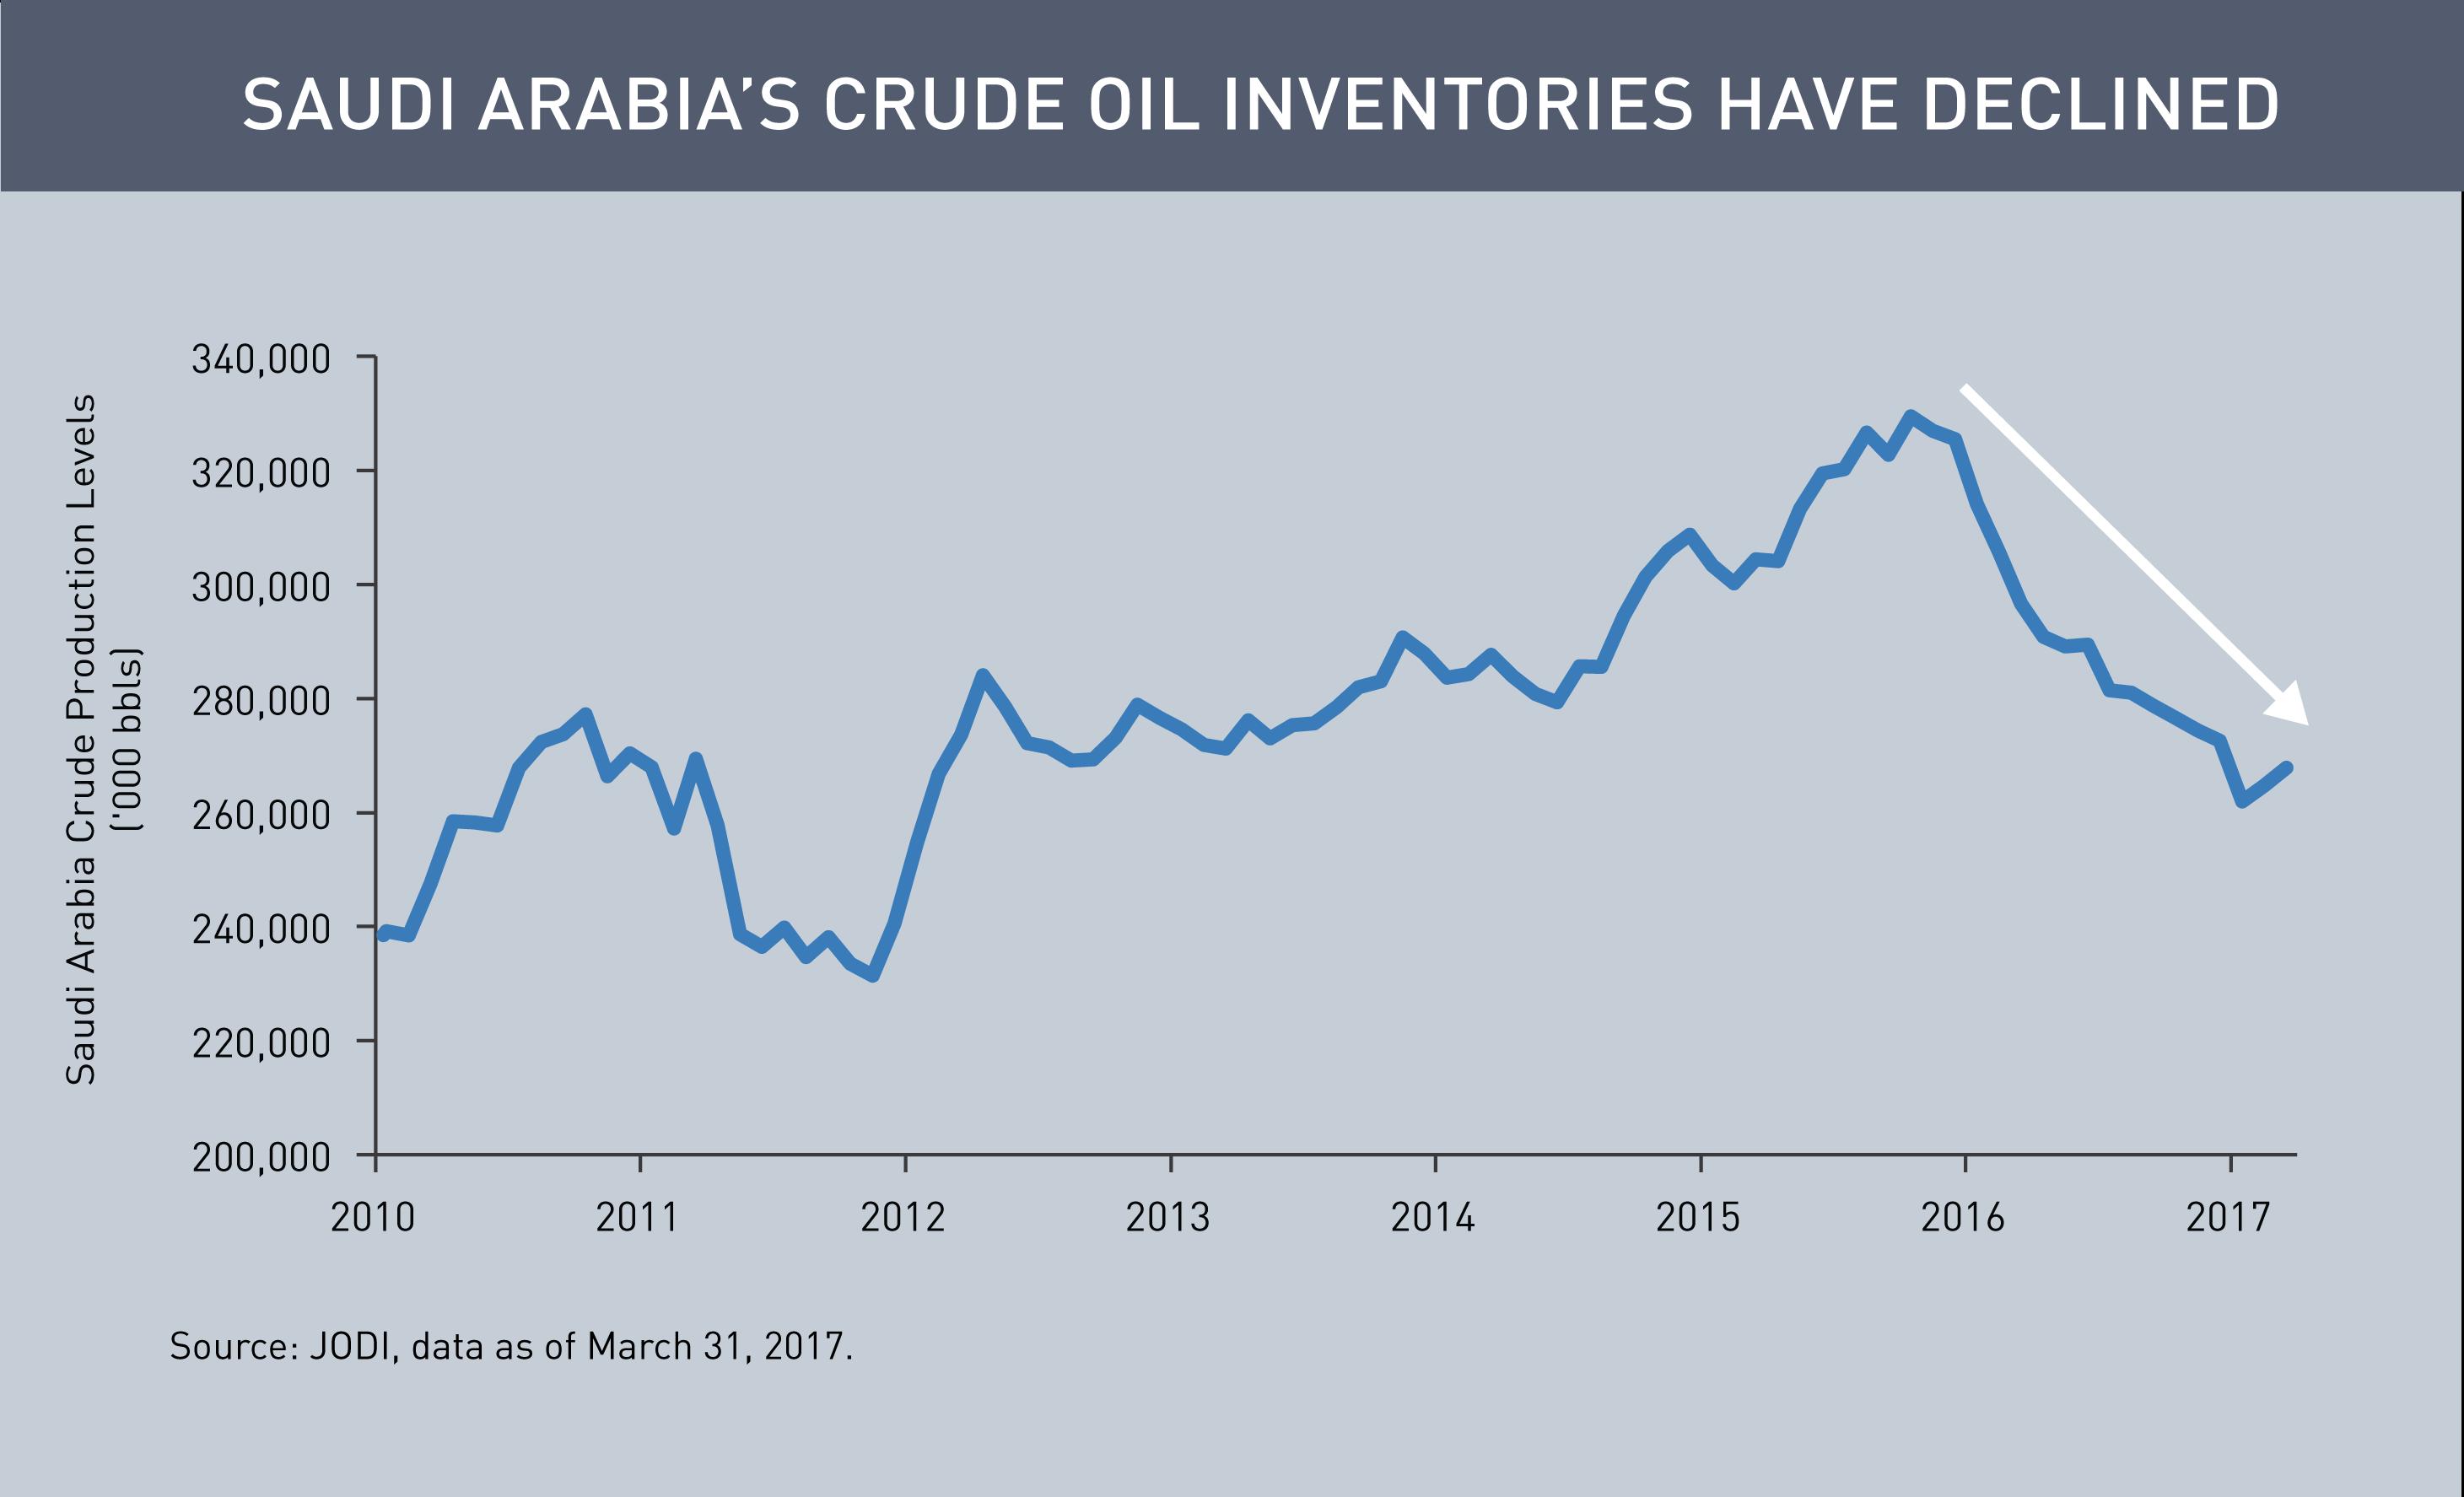 Is OPEC Irrelevant? - Loomis, Sayles & Co. - Commentaries - Advisor ...